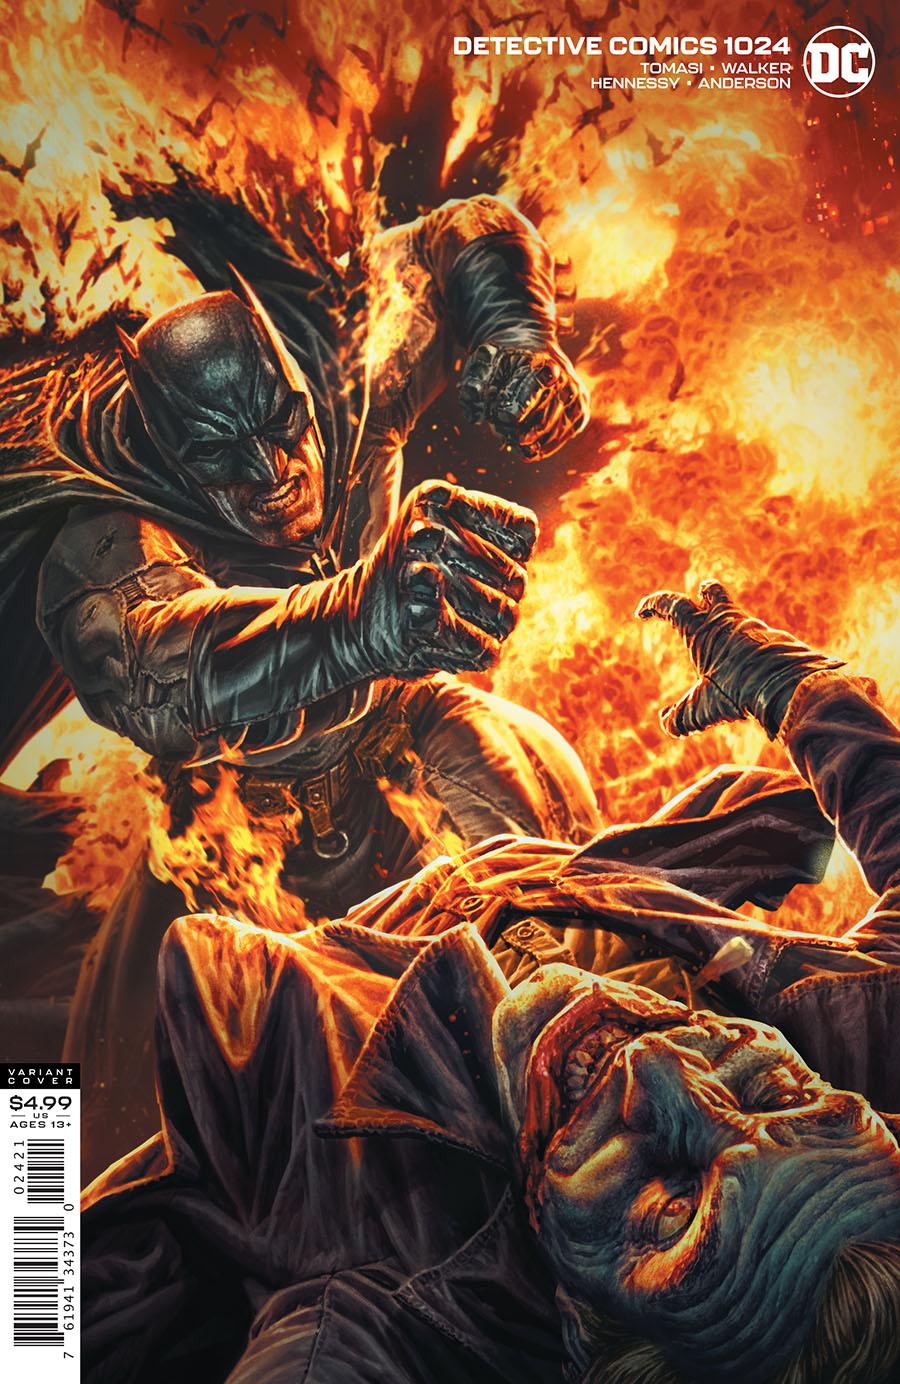 Detective Comics Vol 2 #1024 Cover B Variant Lee Bermejo Card Stock Cover (Joker War Tie-In)